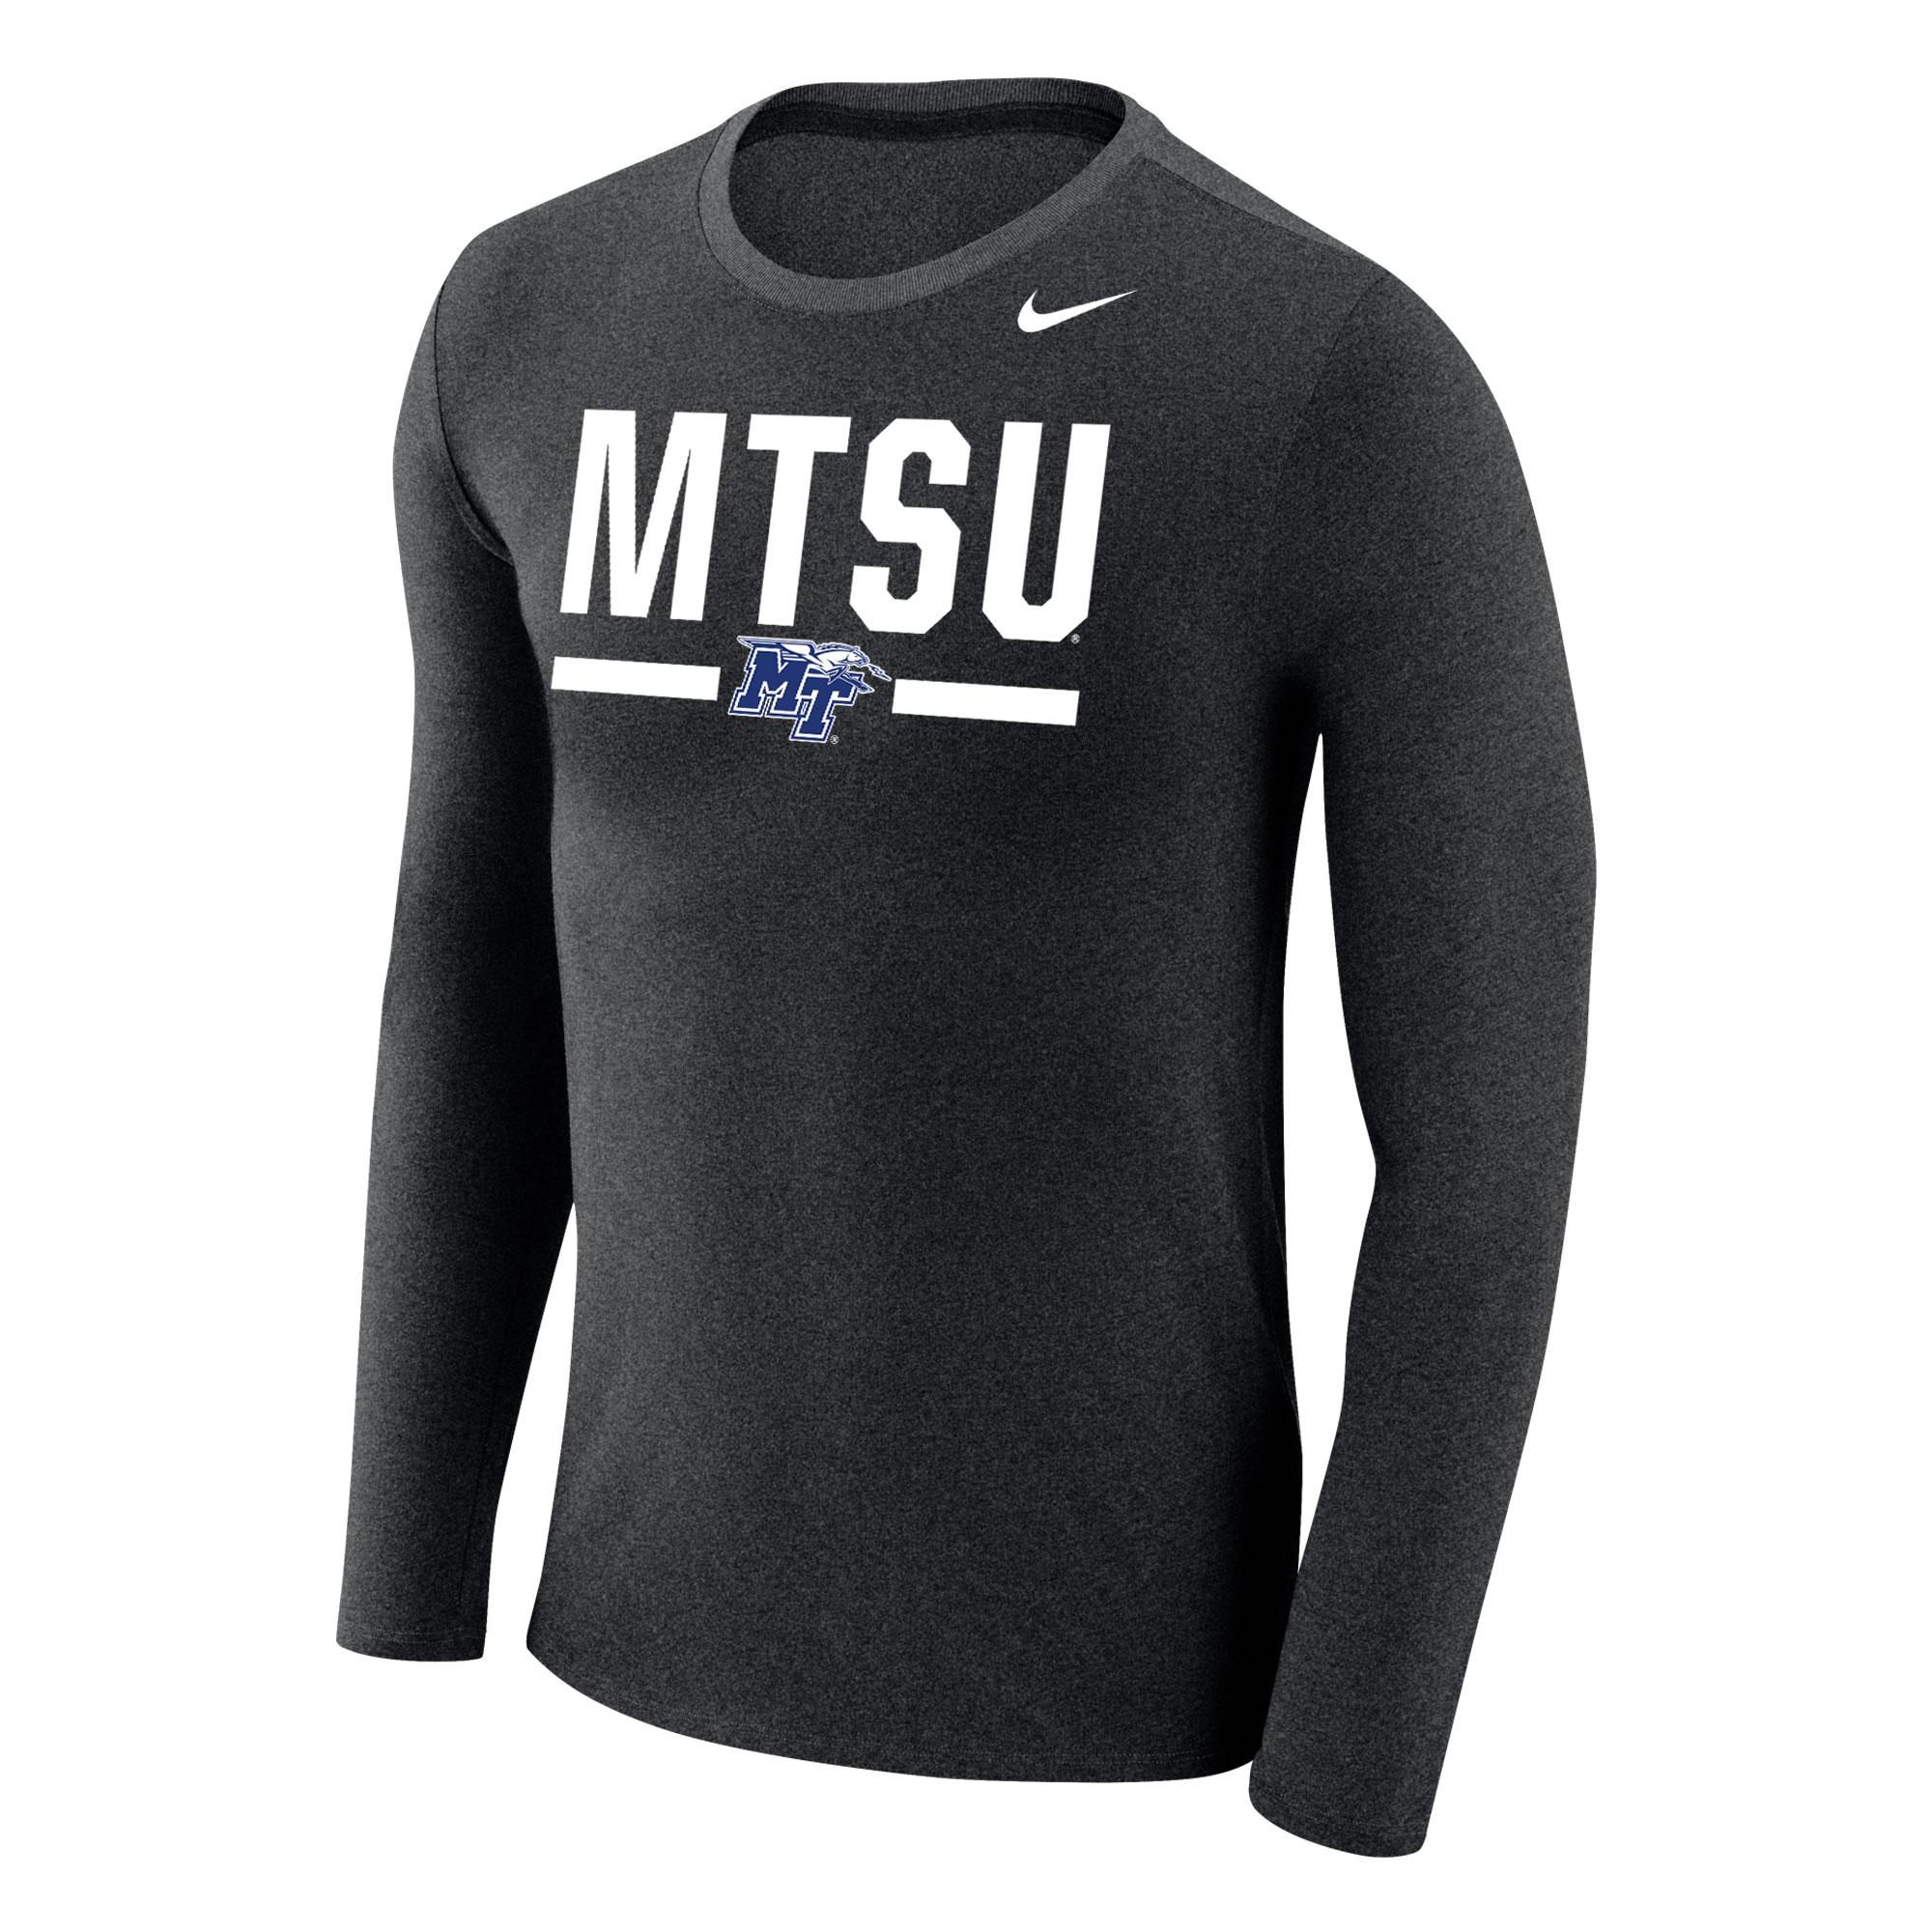 MTSU w/ MT Logo Marled Nike® Long Sleeve Shirt